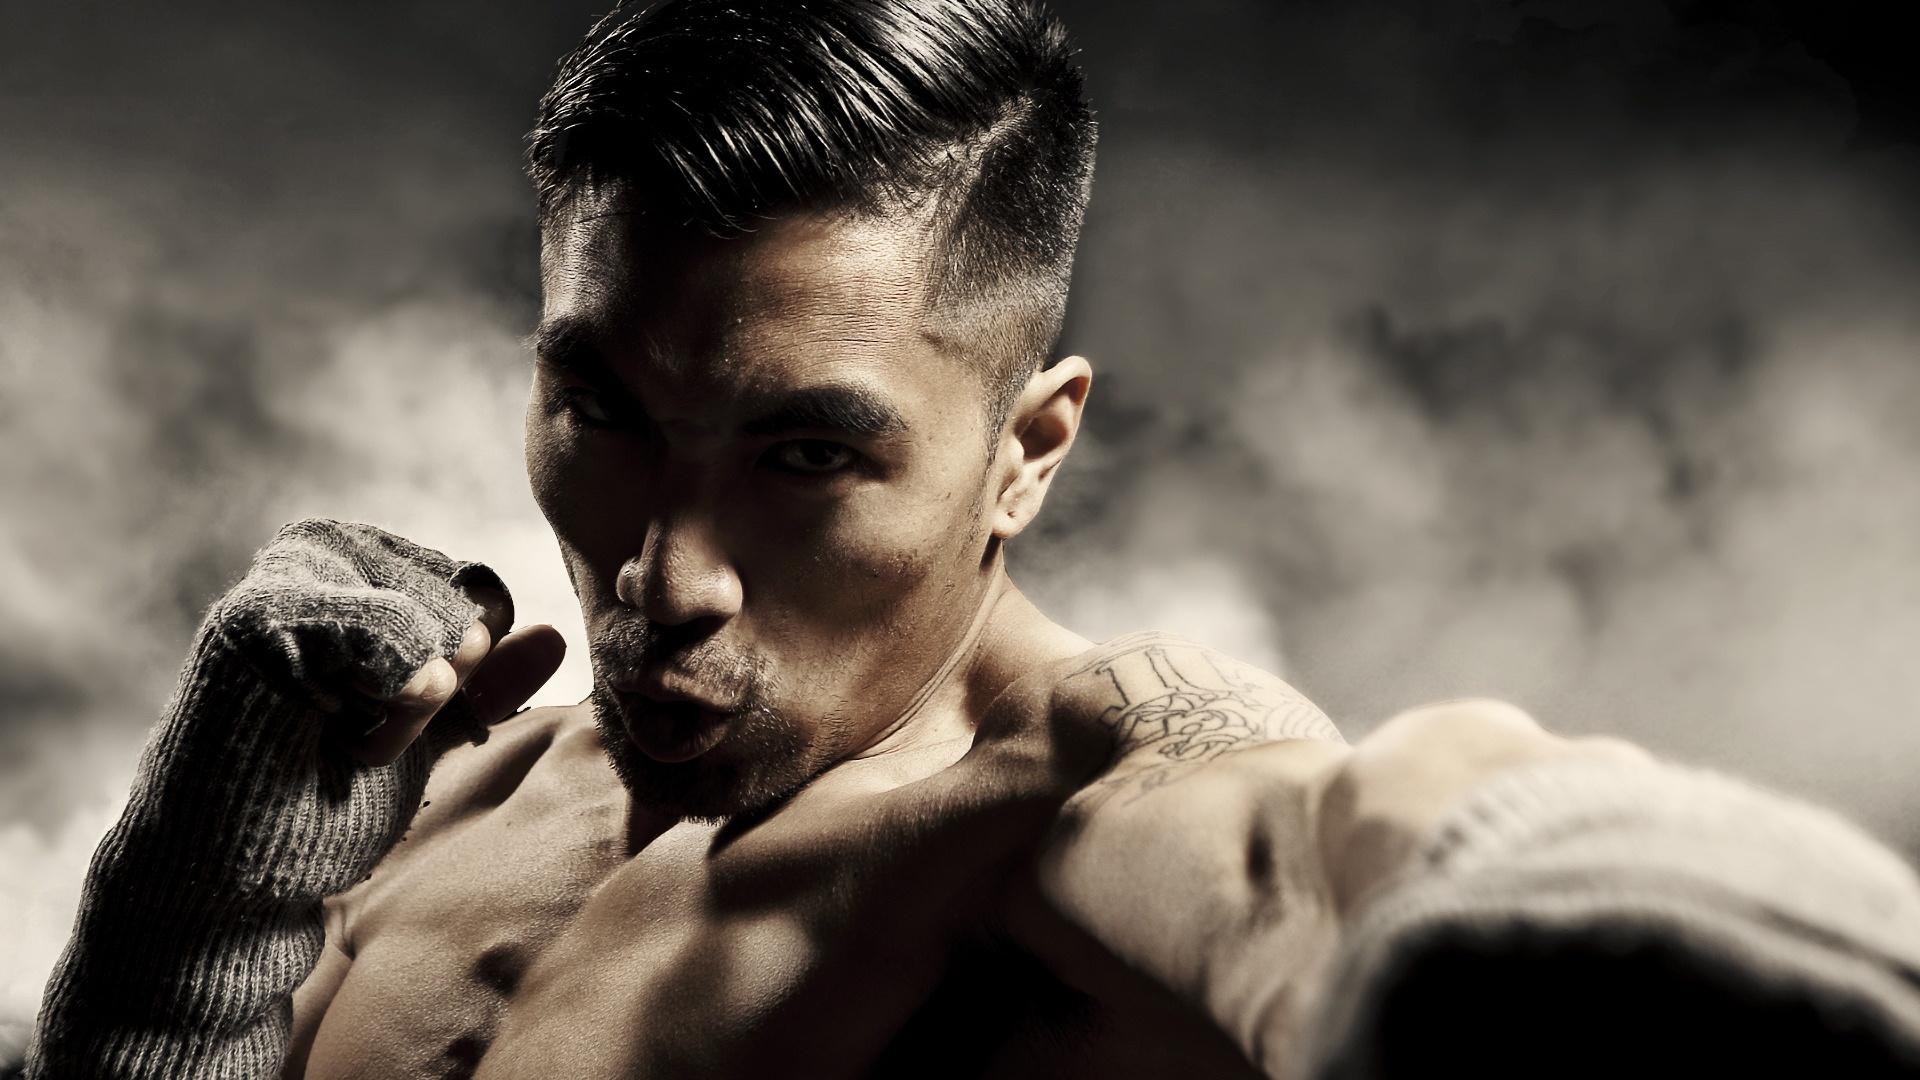 men fitness wallpaper 51321